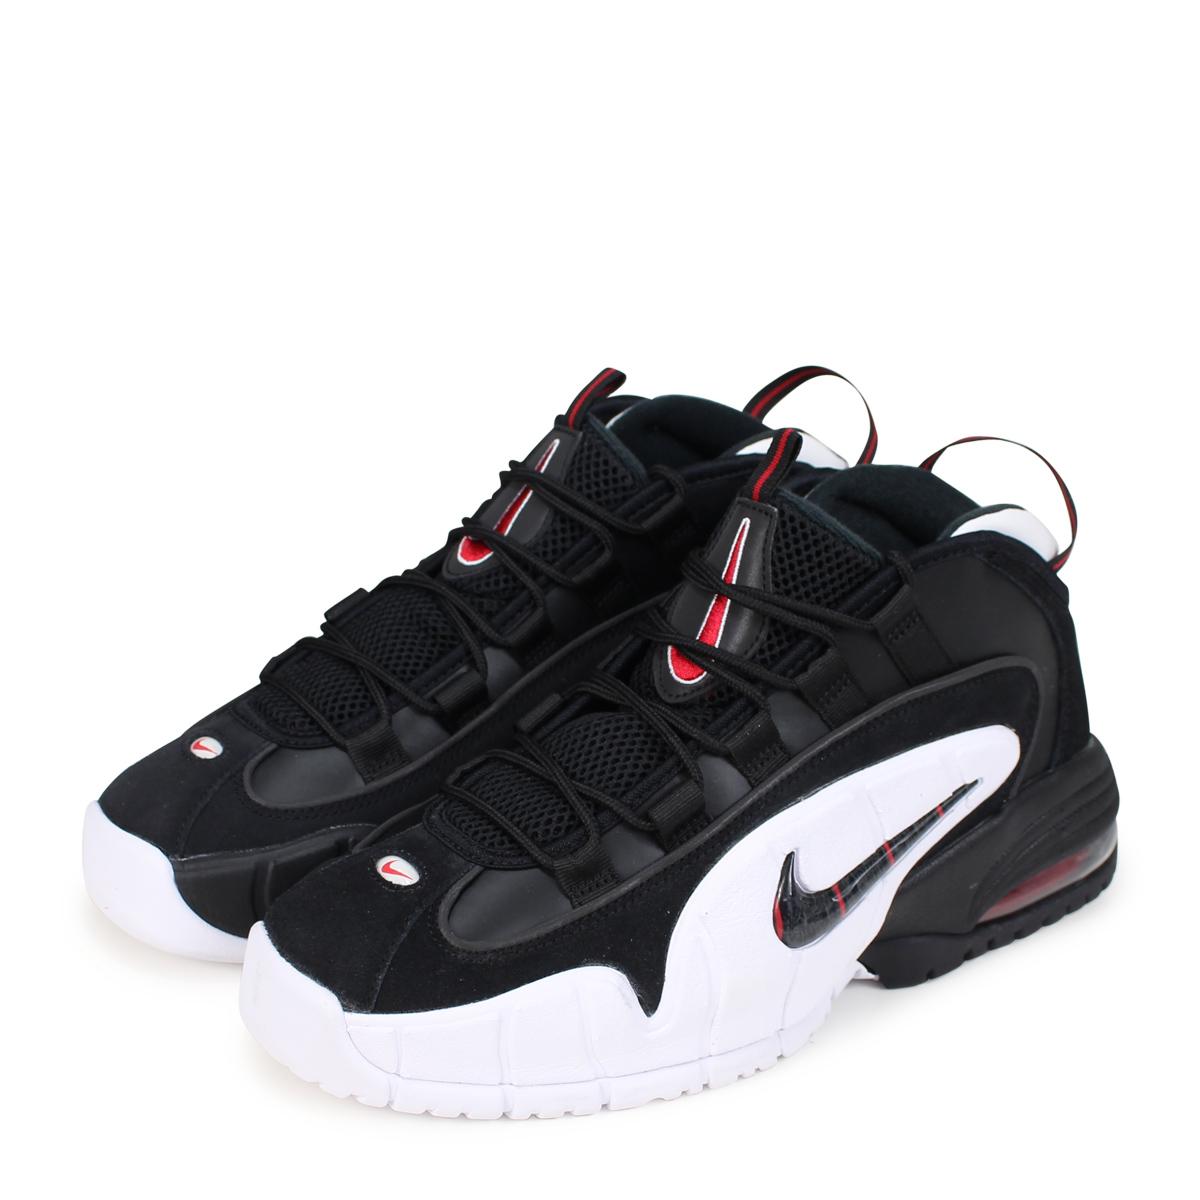 421c37673b9 ALLSPORTS  NIKE AIR MAX PENNY Kie Ney AMAX penny sneakers men ...